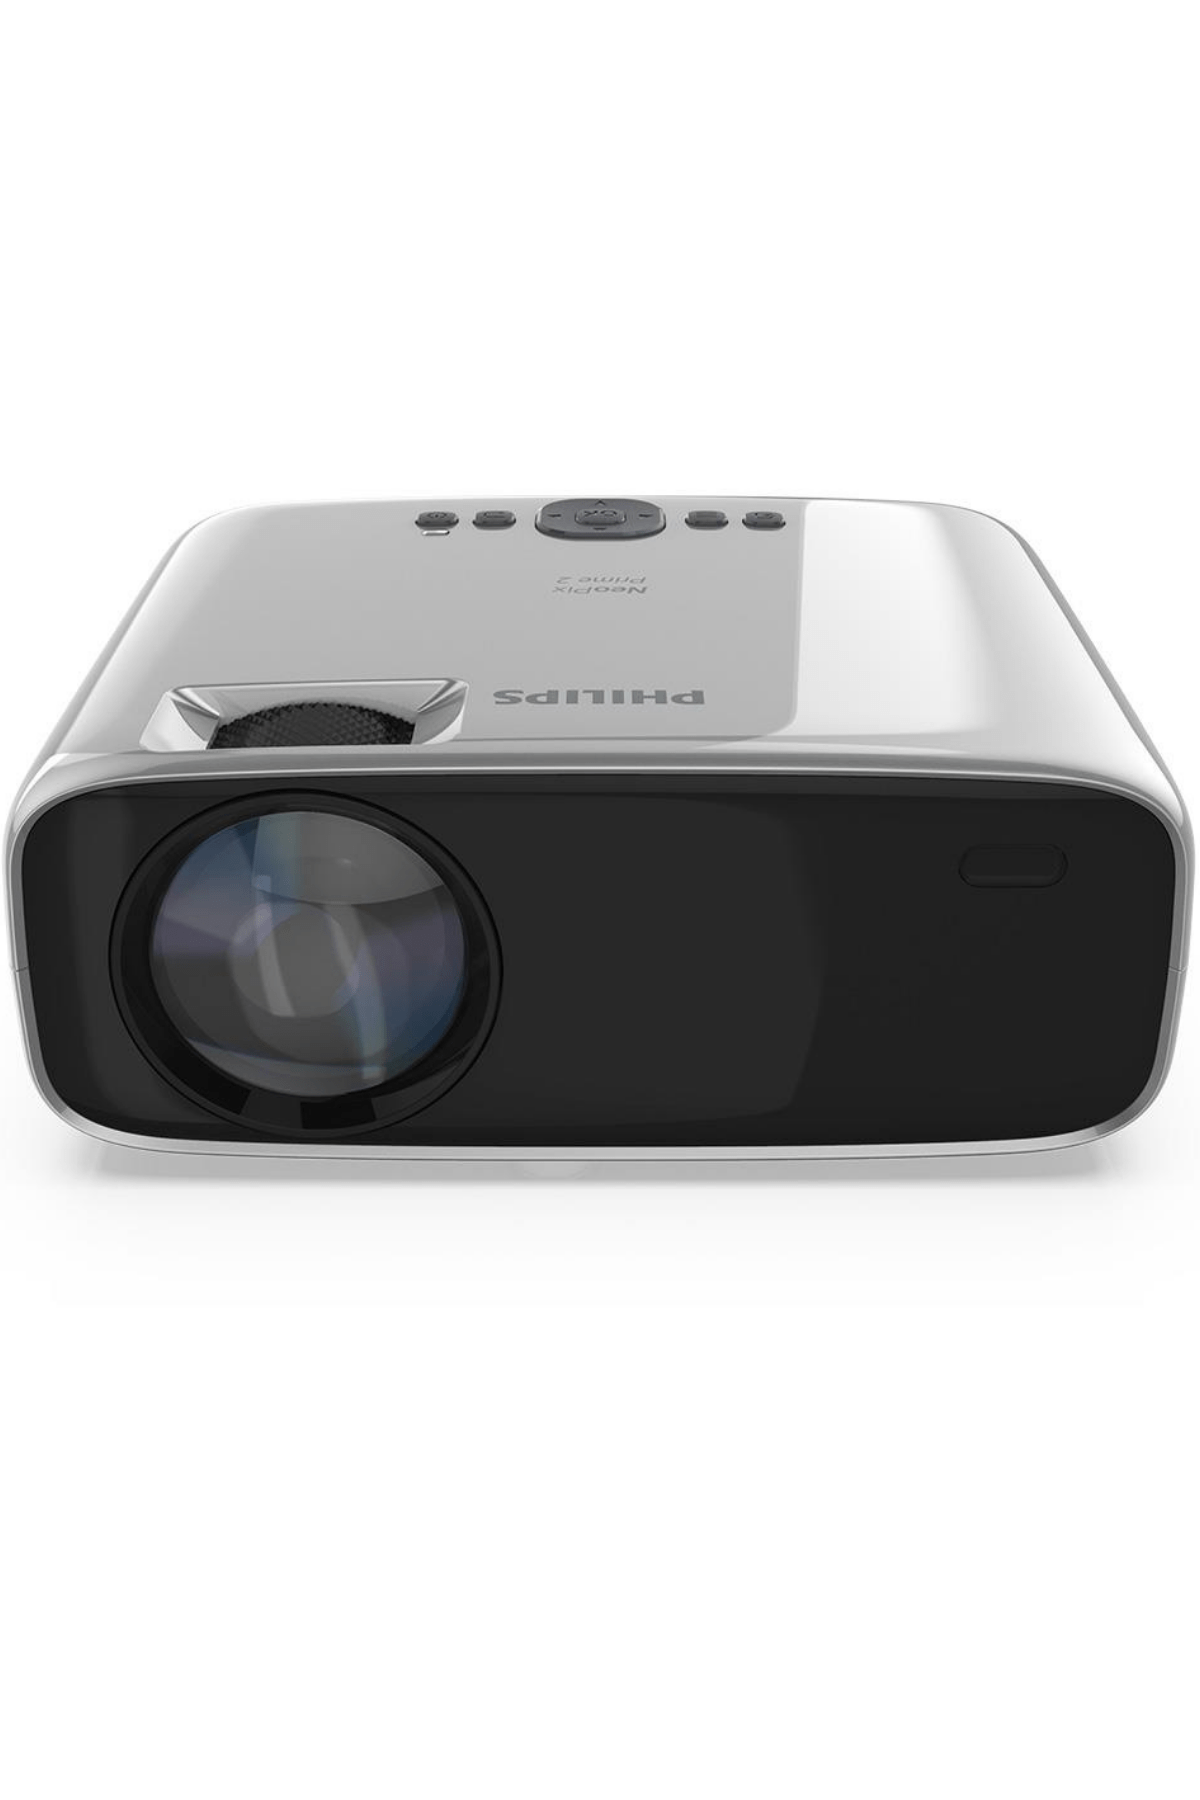 Philips Neopix Prime 2 Smart Akıllı Dahili Wifi Youtube Netflix LCD LED Projeksiyon Cihazı